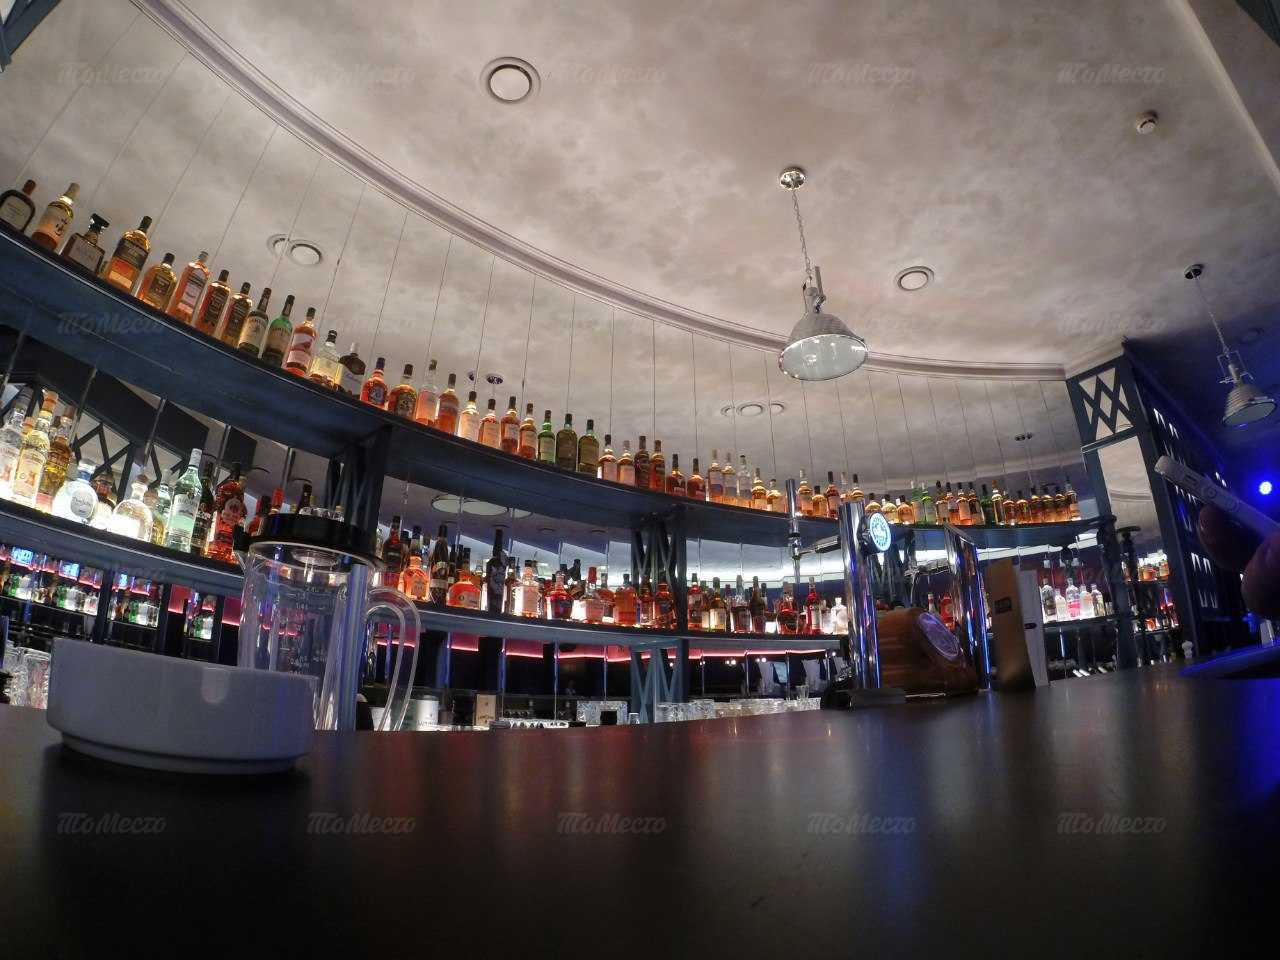 Меню бара, ресторана GATSBY (Гэтсби) на проспекте Культуры